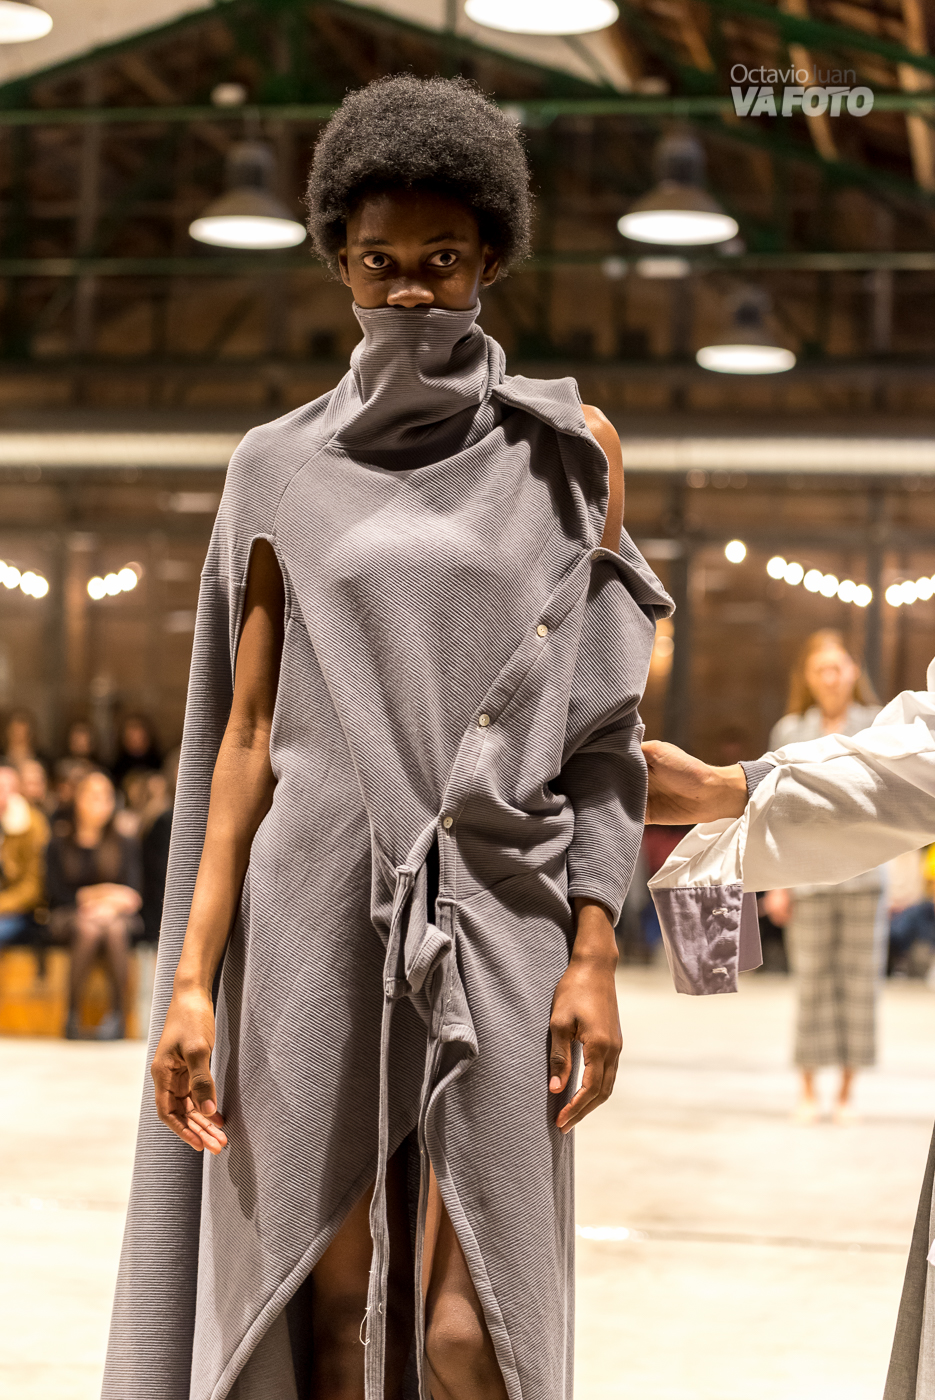 00211 ARTEMODA DSC4310 20181124 - Evento: Arte + Moda Valencia